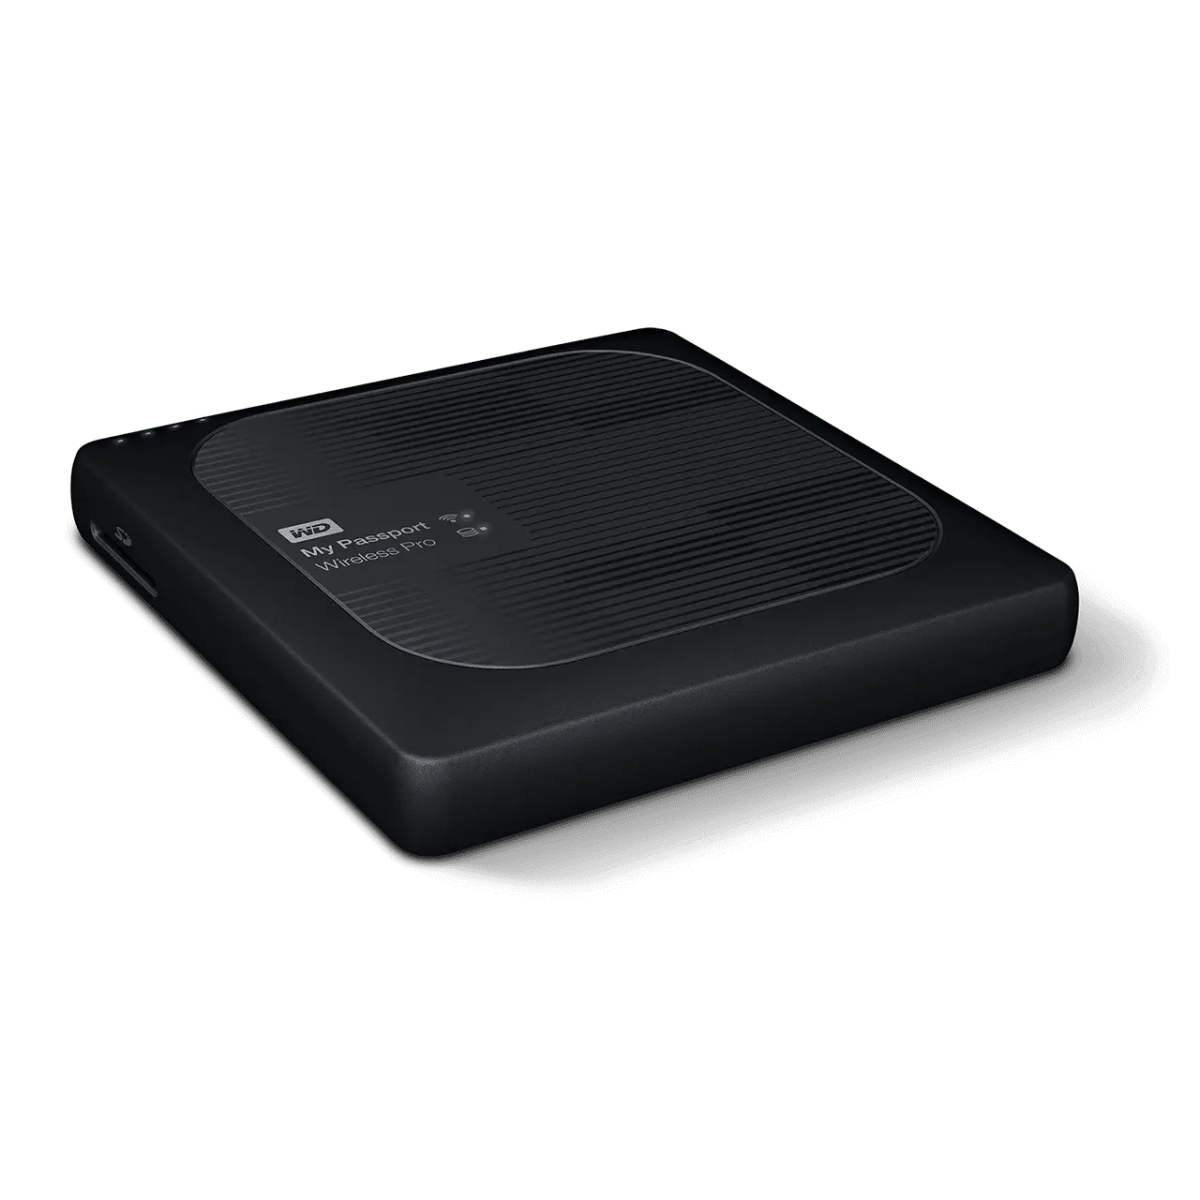 WD-Wireless-Passport-Pro